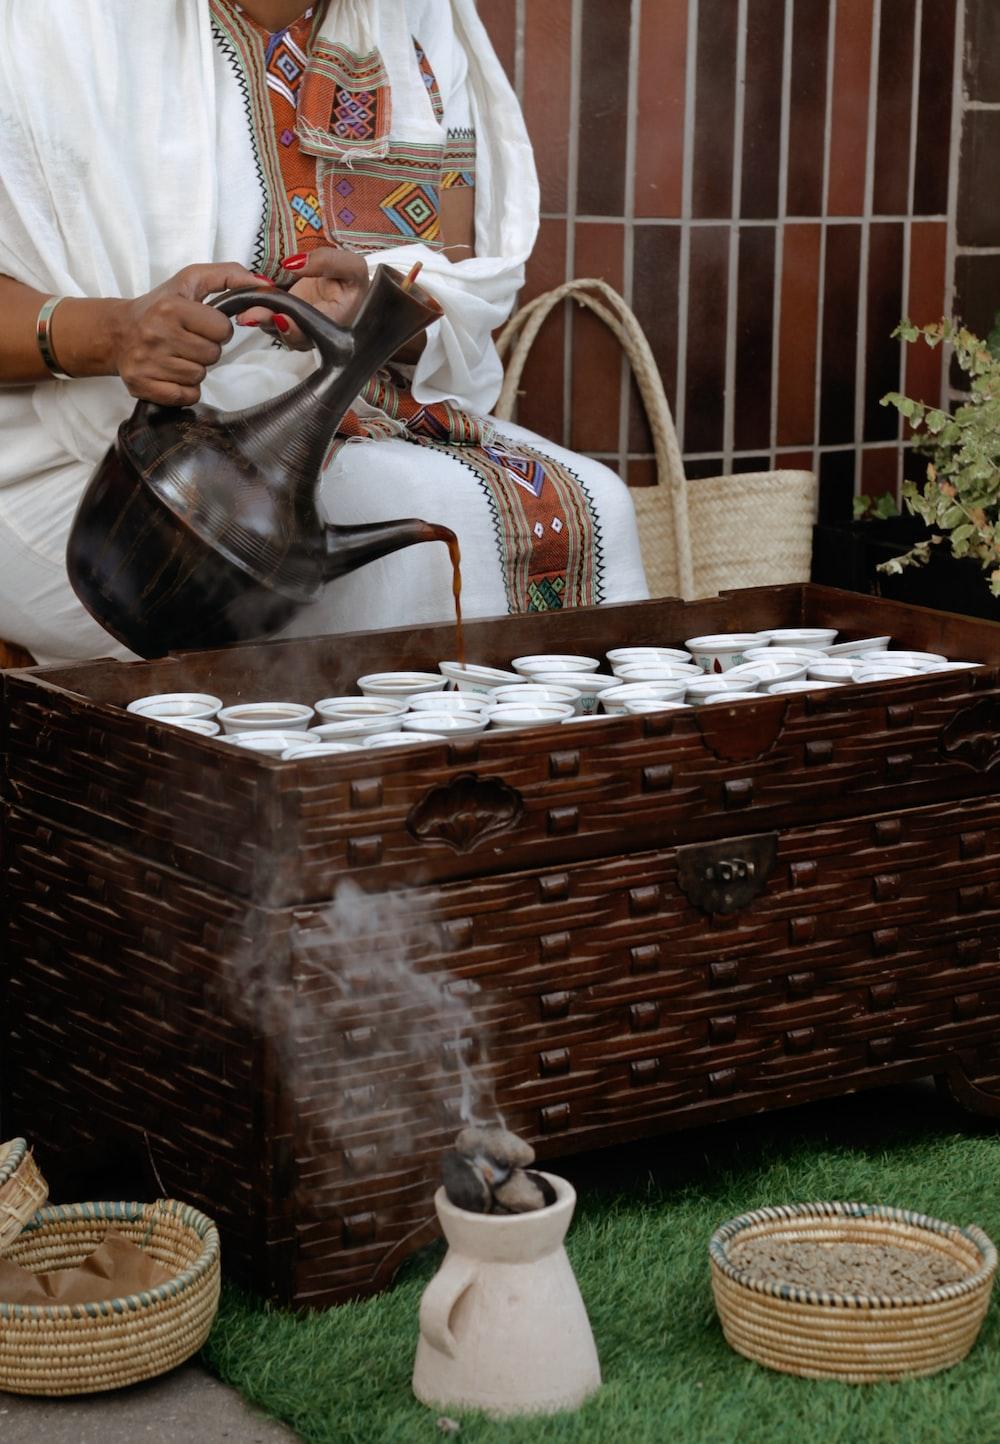 black ceramic teapot on brown woven table